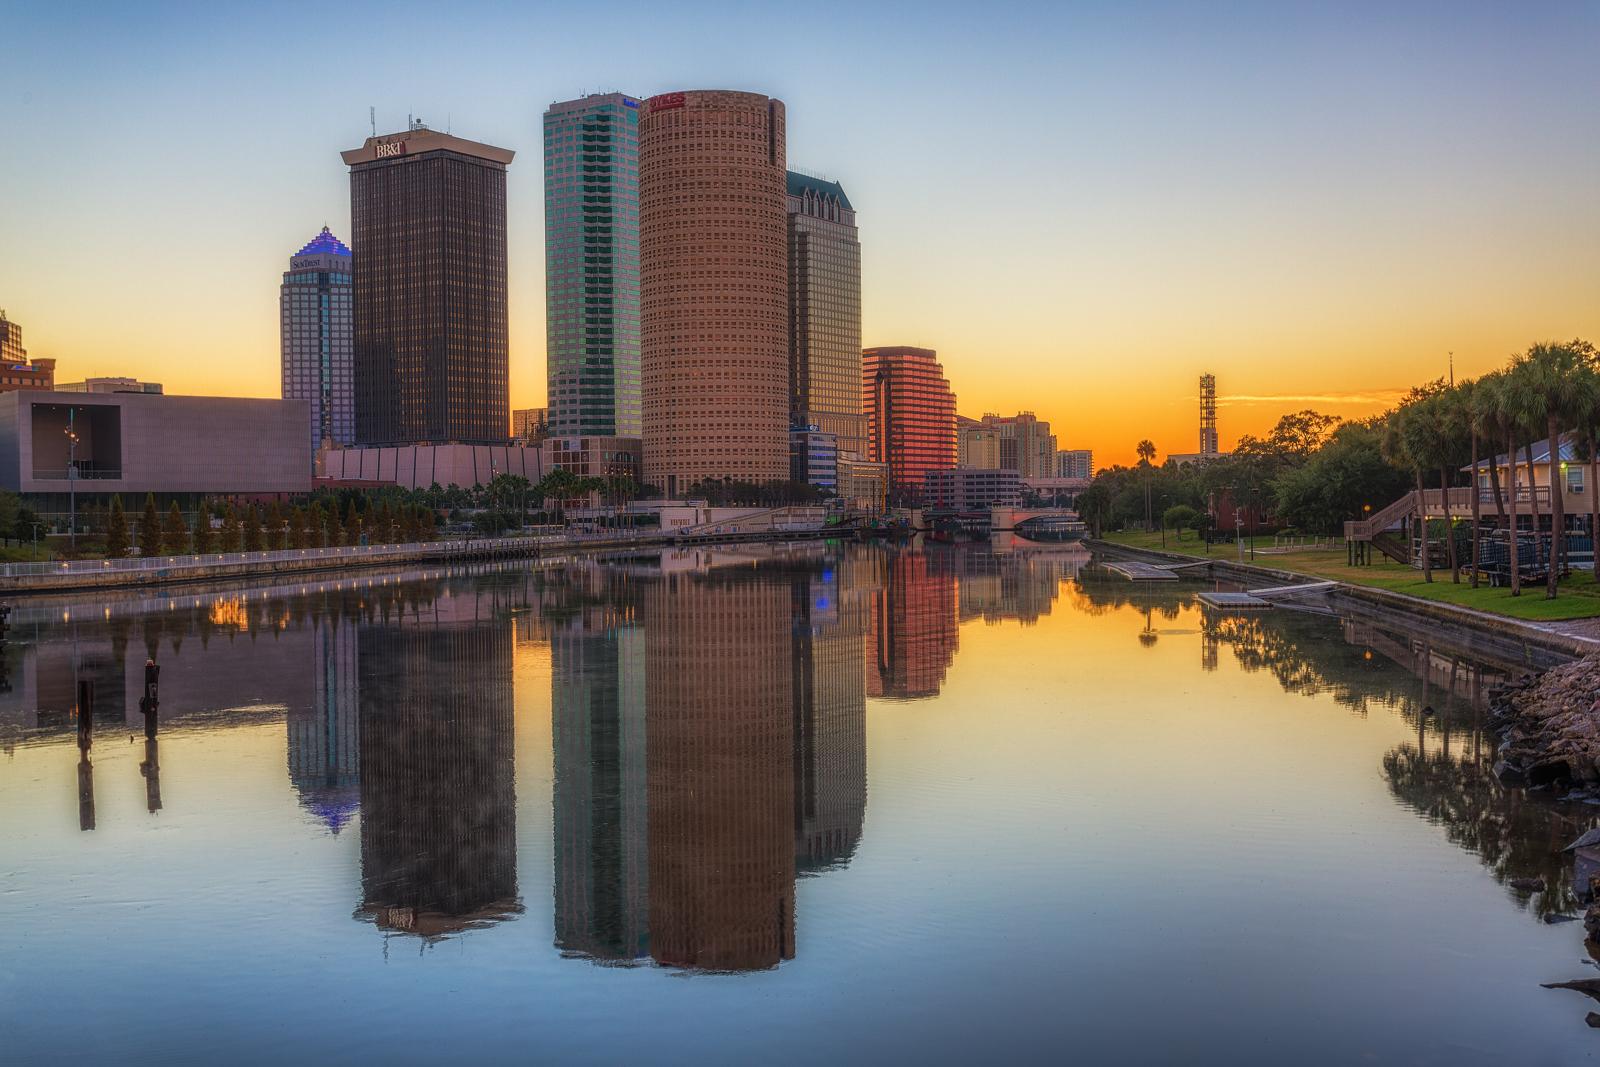 Mirror Image of Tampa Skyline at Sunrise